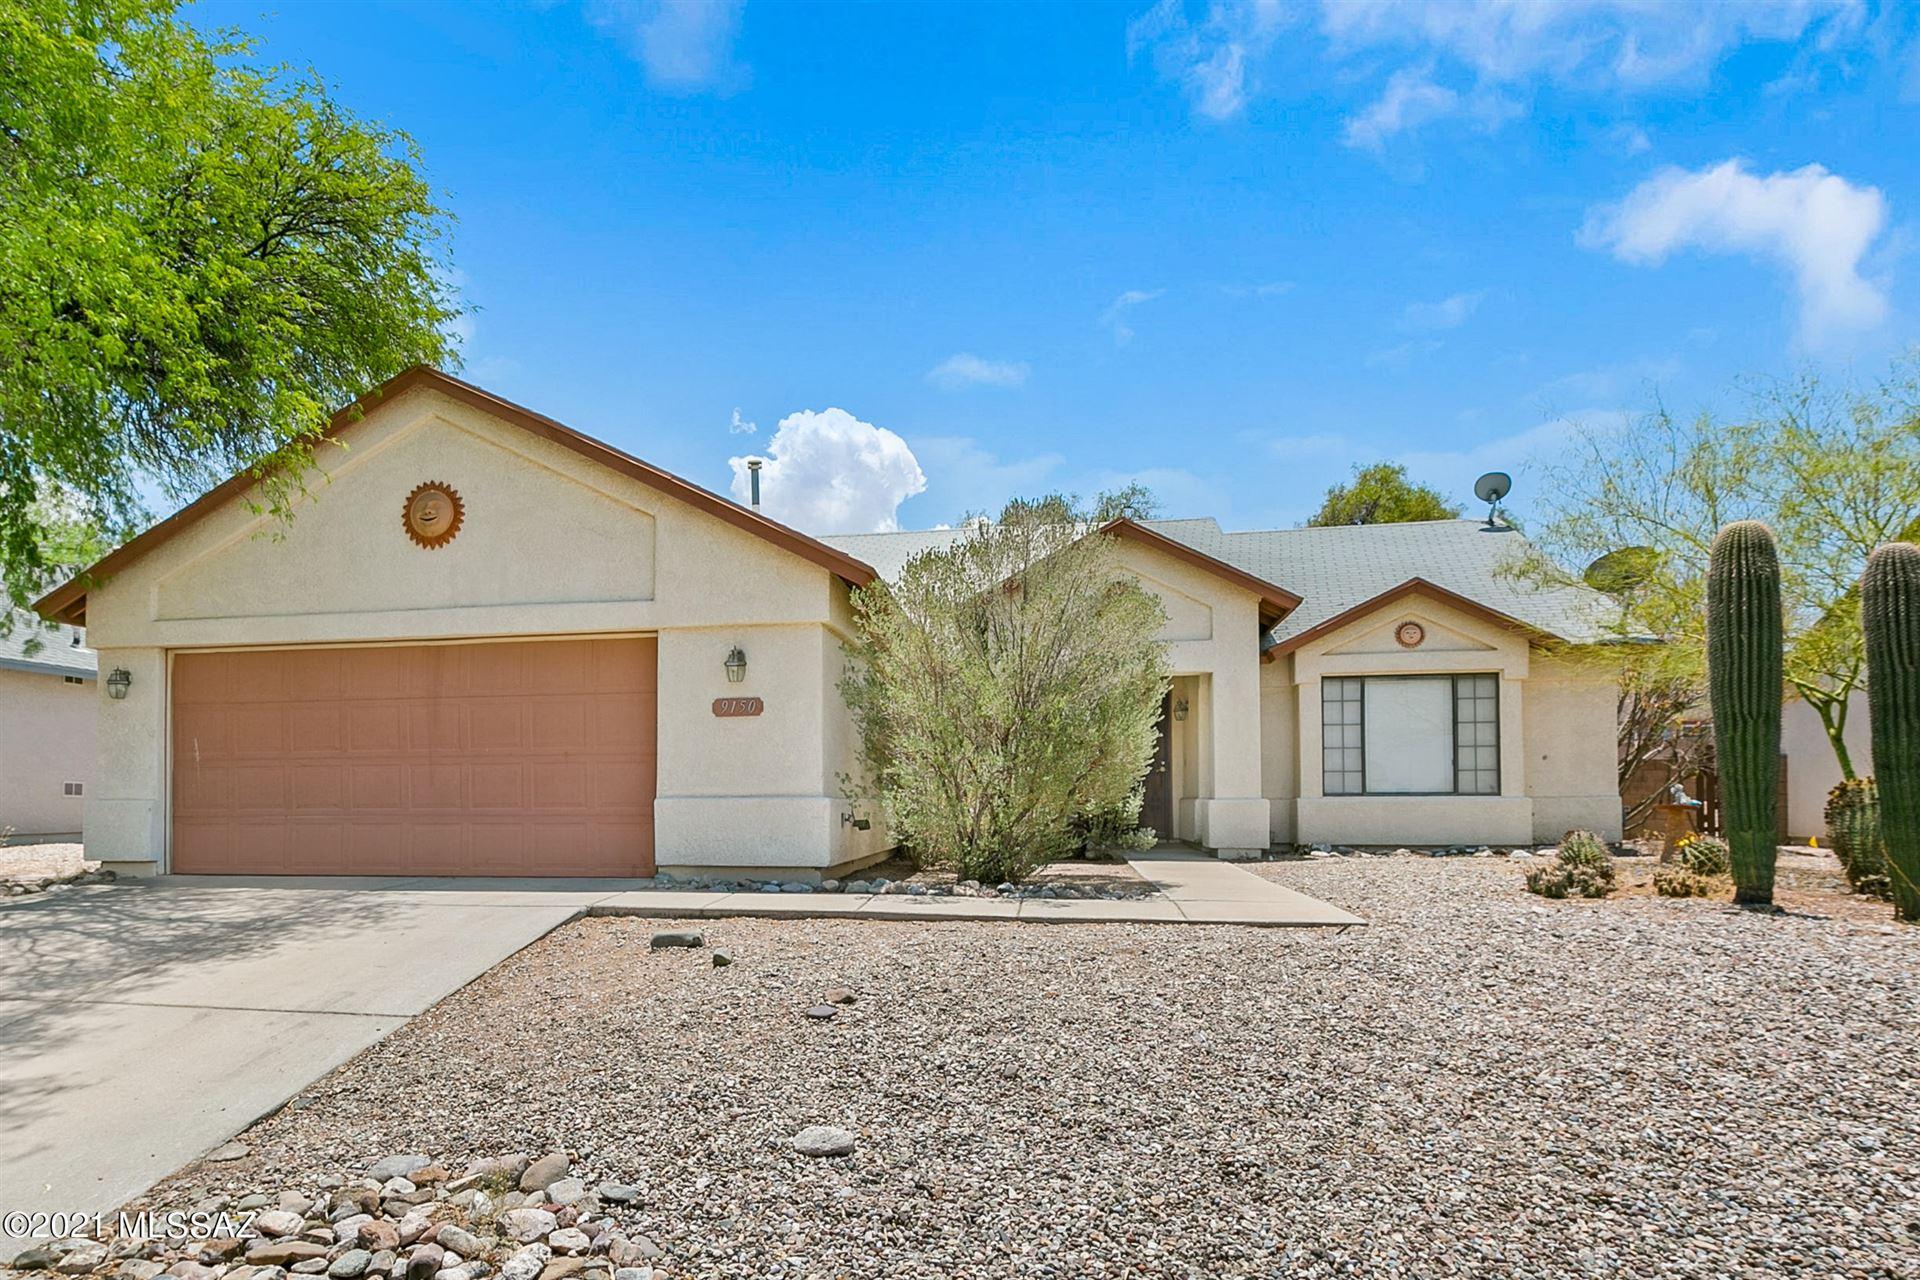 9150 E Spire Lane, Tucson, AZ 85715 - MLS#: 22116451